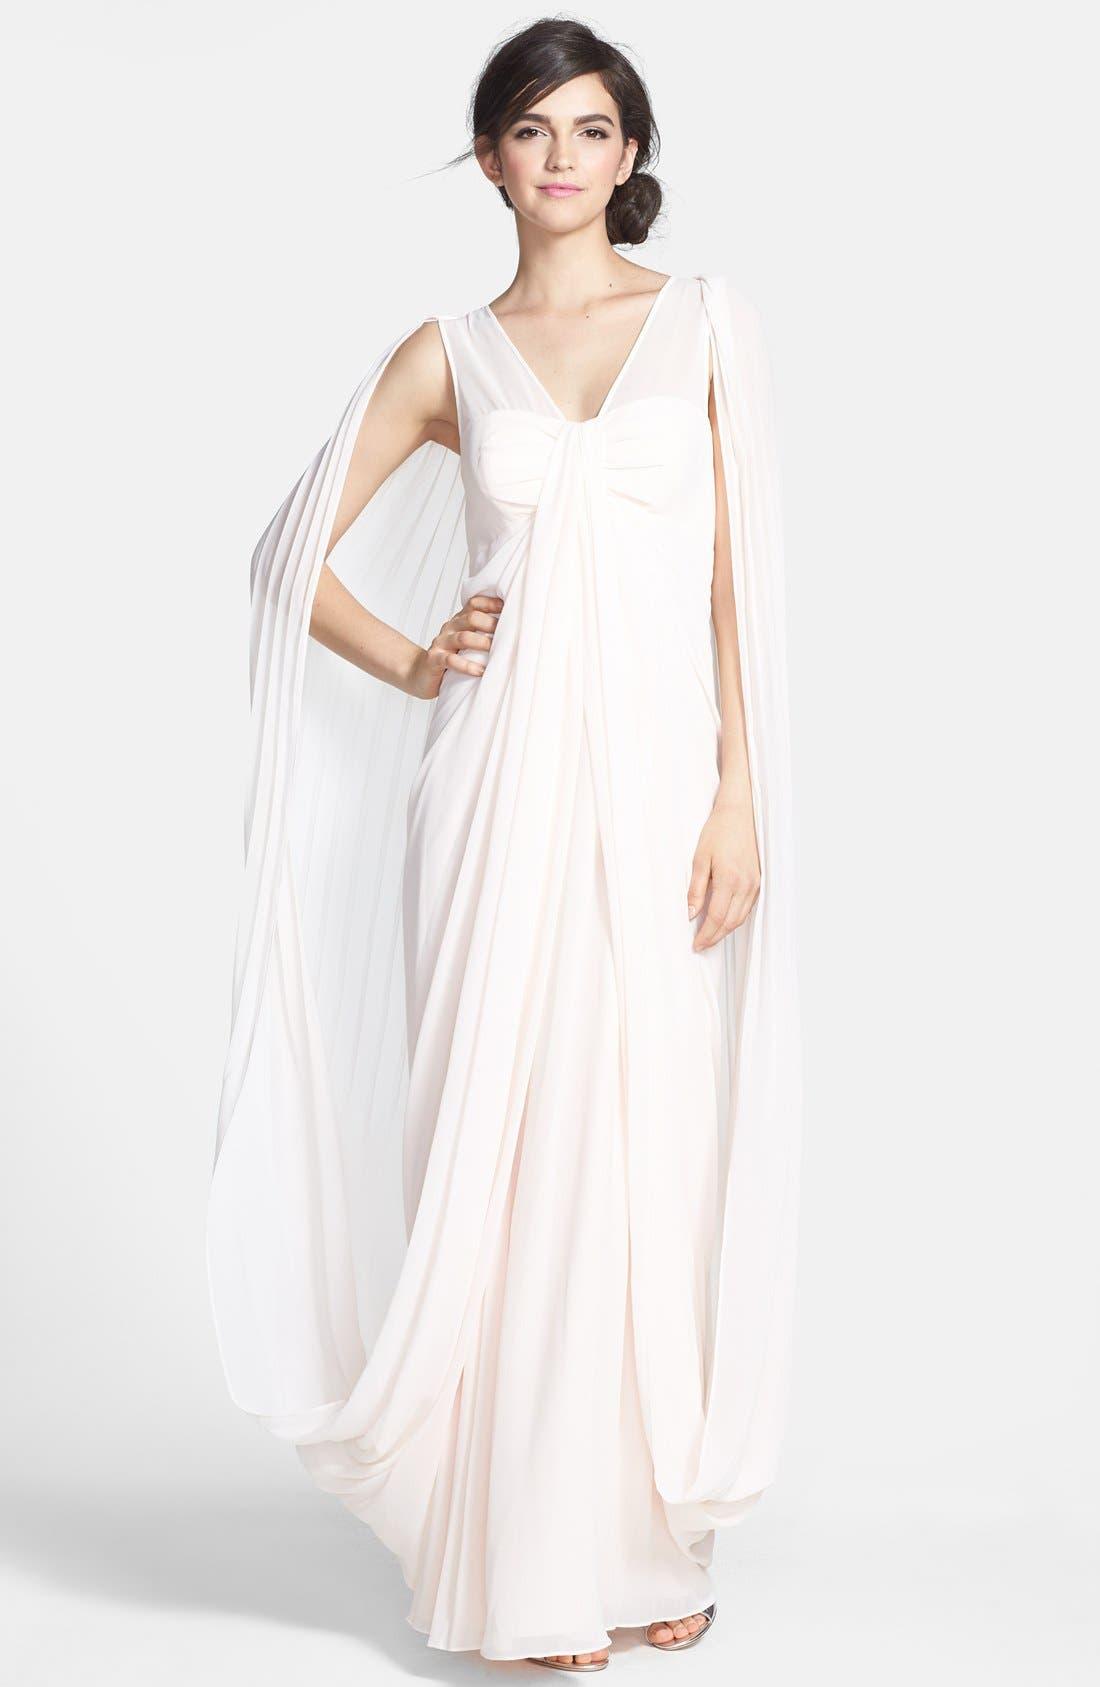 Alternate Image 1 Selected - Ted Baker London 'Lyonele' Cape Back Draped Chiffon Maxi Dress